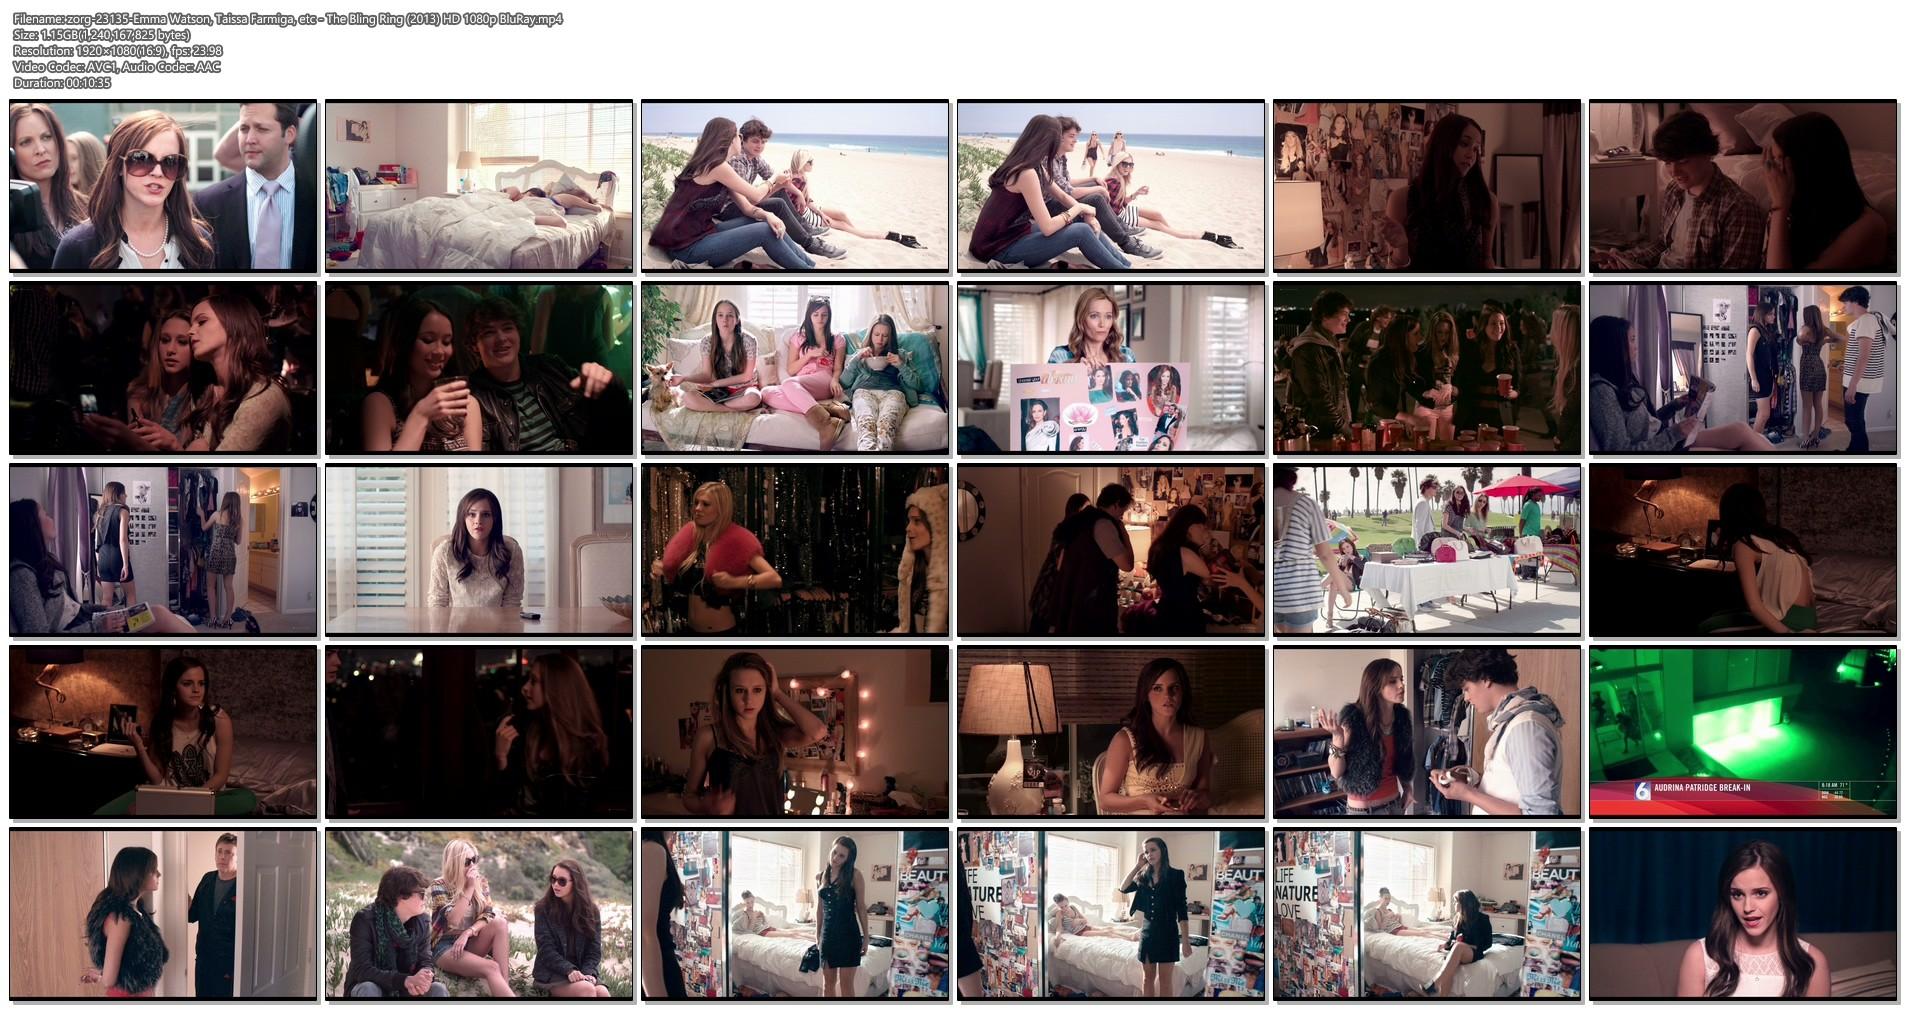 Emma Watson hot Taissa Farmiga and others sexy - The Bling Ring (2013) HD 1080p BluRay (1)